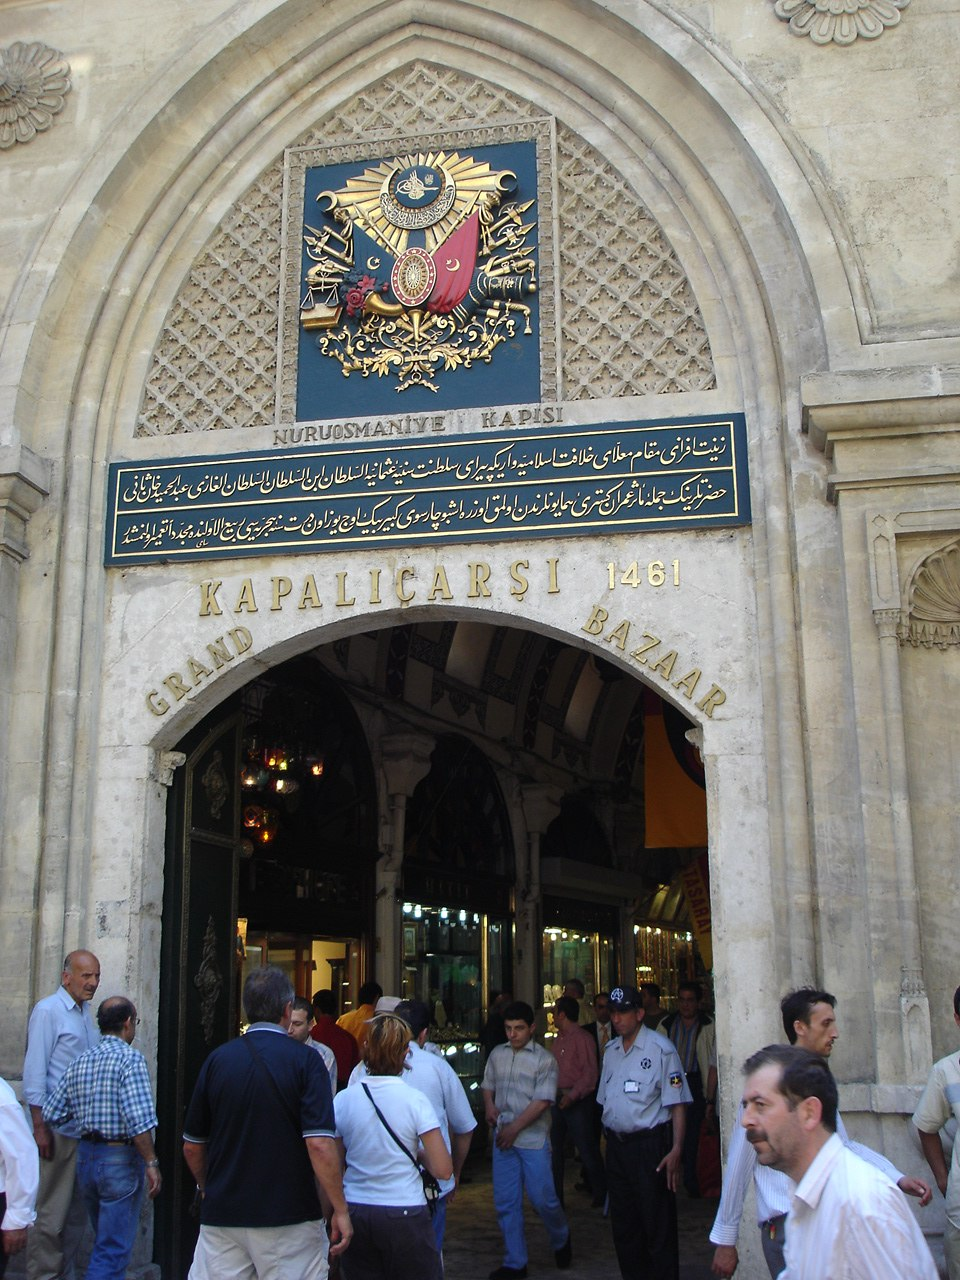 DSC04589 Istanbul - Bazaar - Foto G. Dall%27Orto 29-5-2006